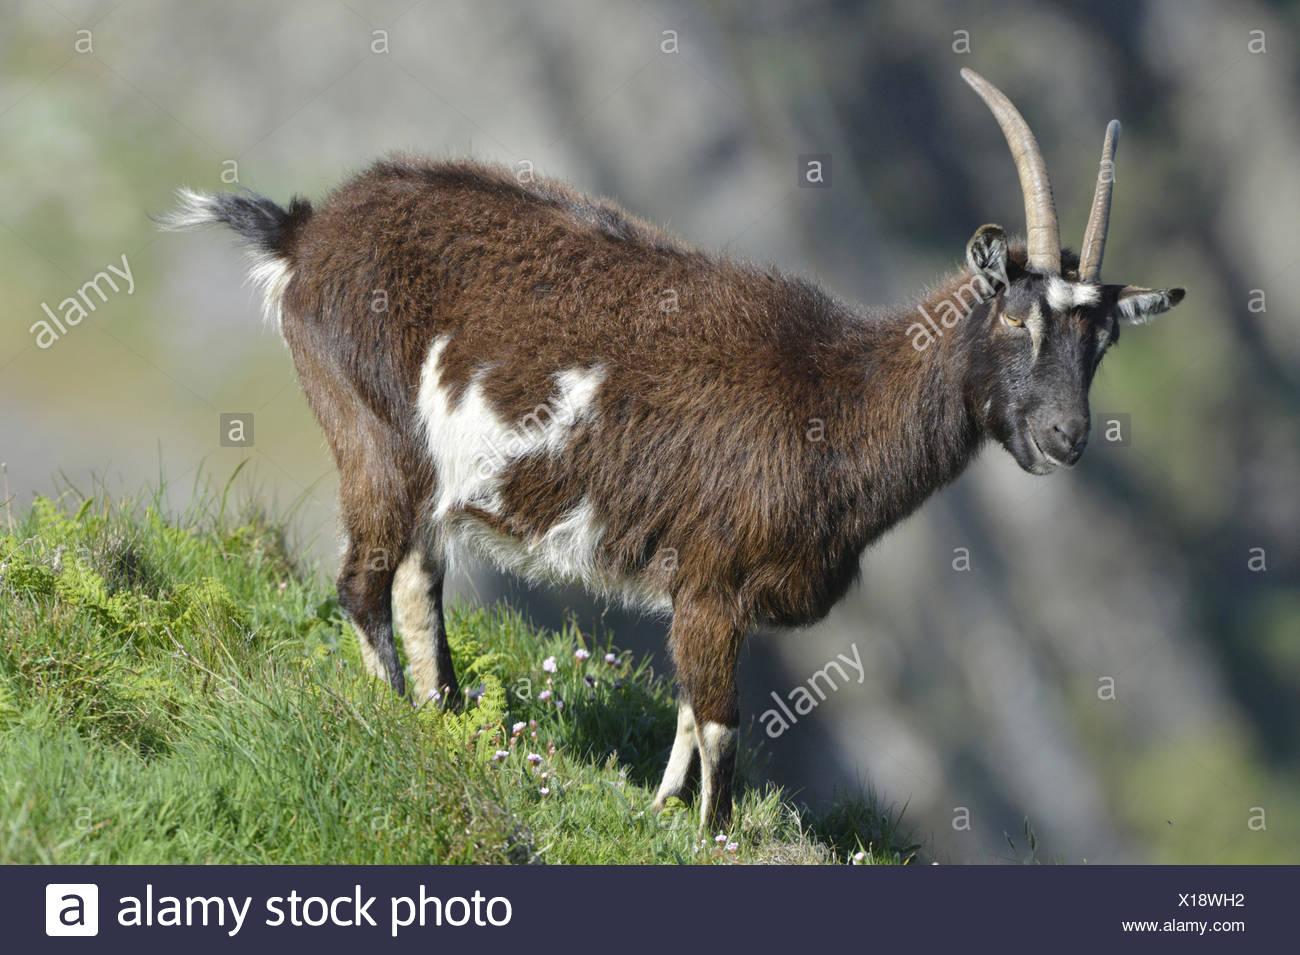 - Chèvre Capra hircus Photo Stock